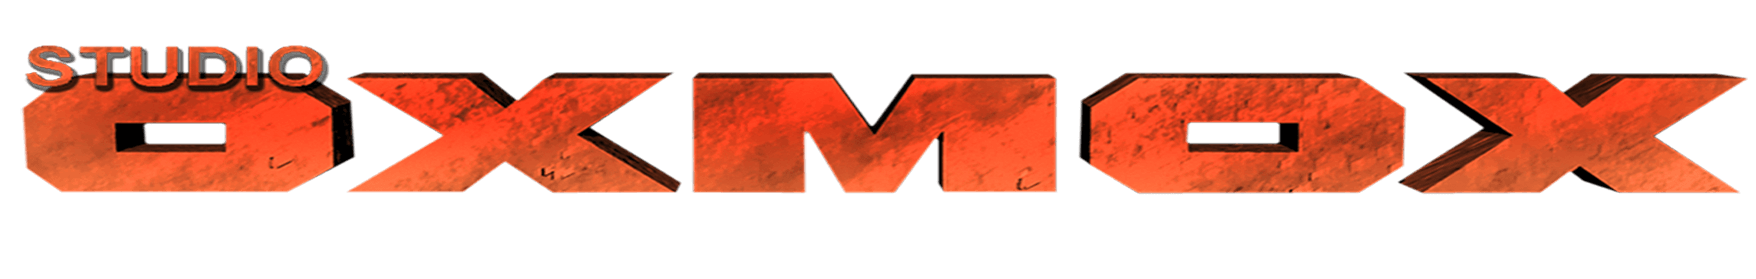 Studio Oxmox Pty. Ltd. Logo